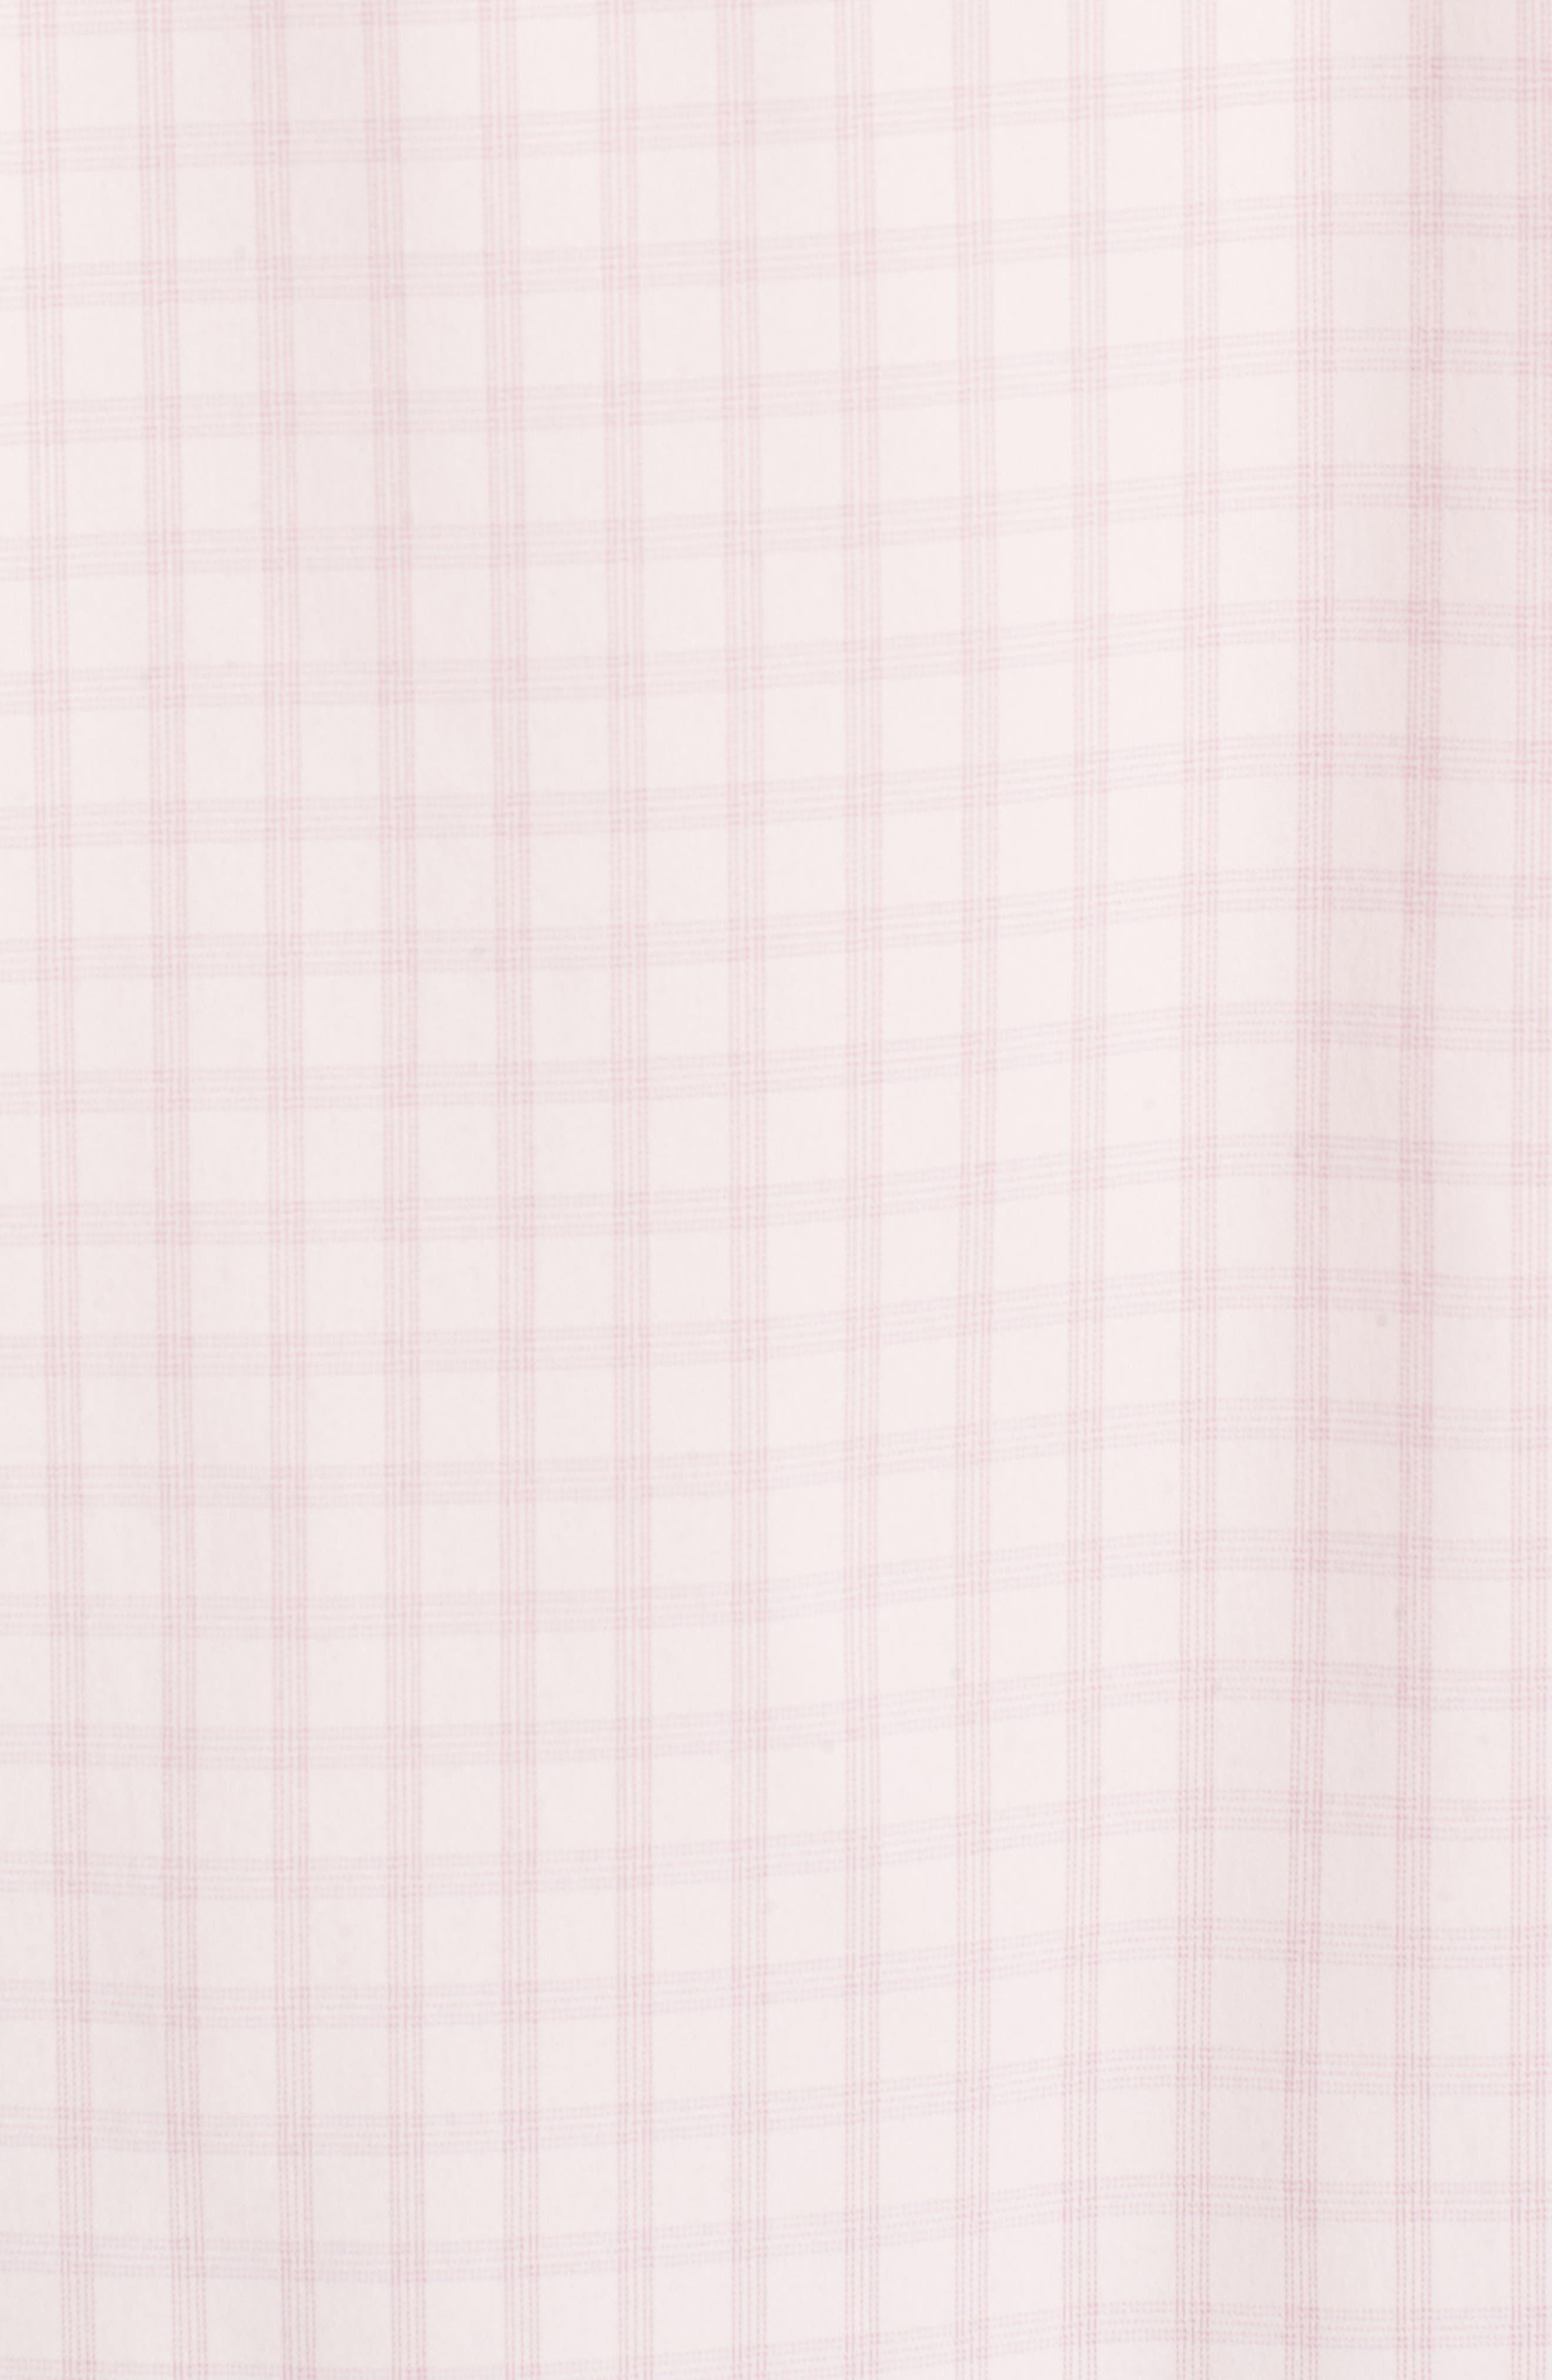 Slim Fit Check Performance Sport Shirt,                             Alternate thumbnail 5, color,                             Gulf Point Plaid - Skiivy Pink